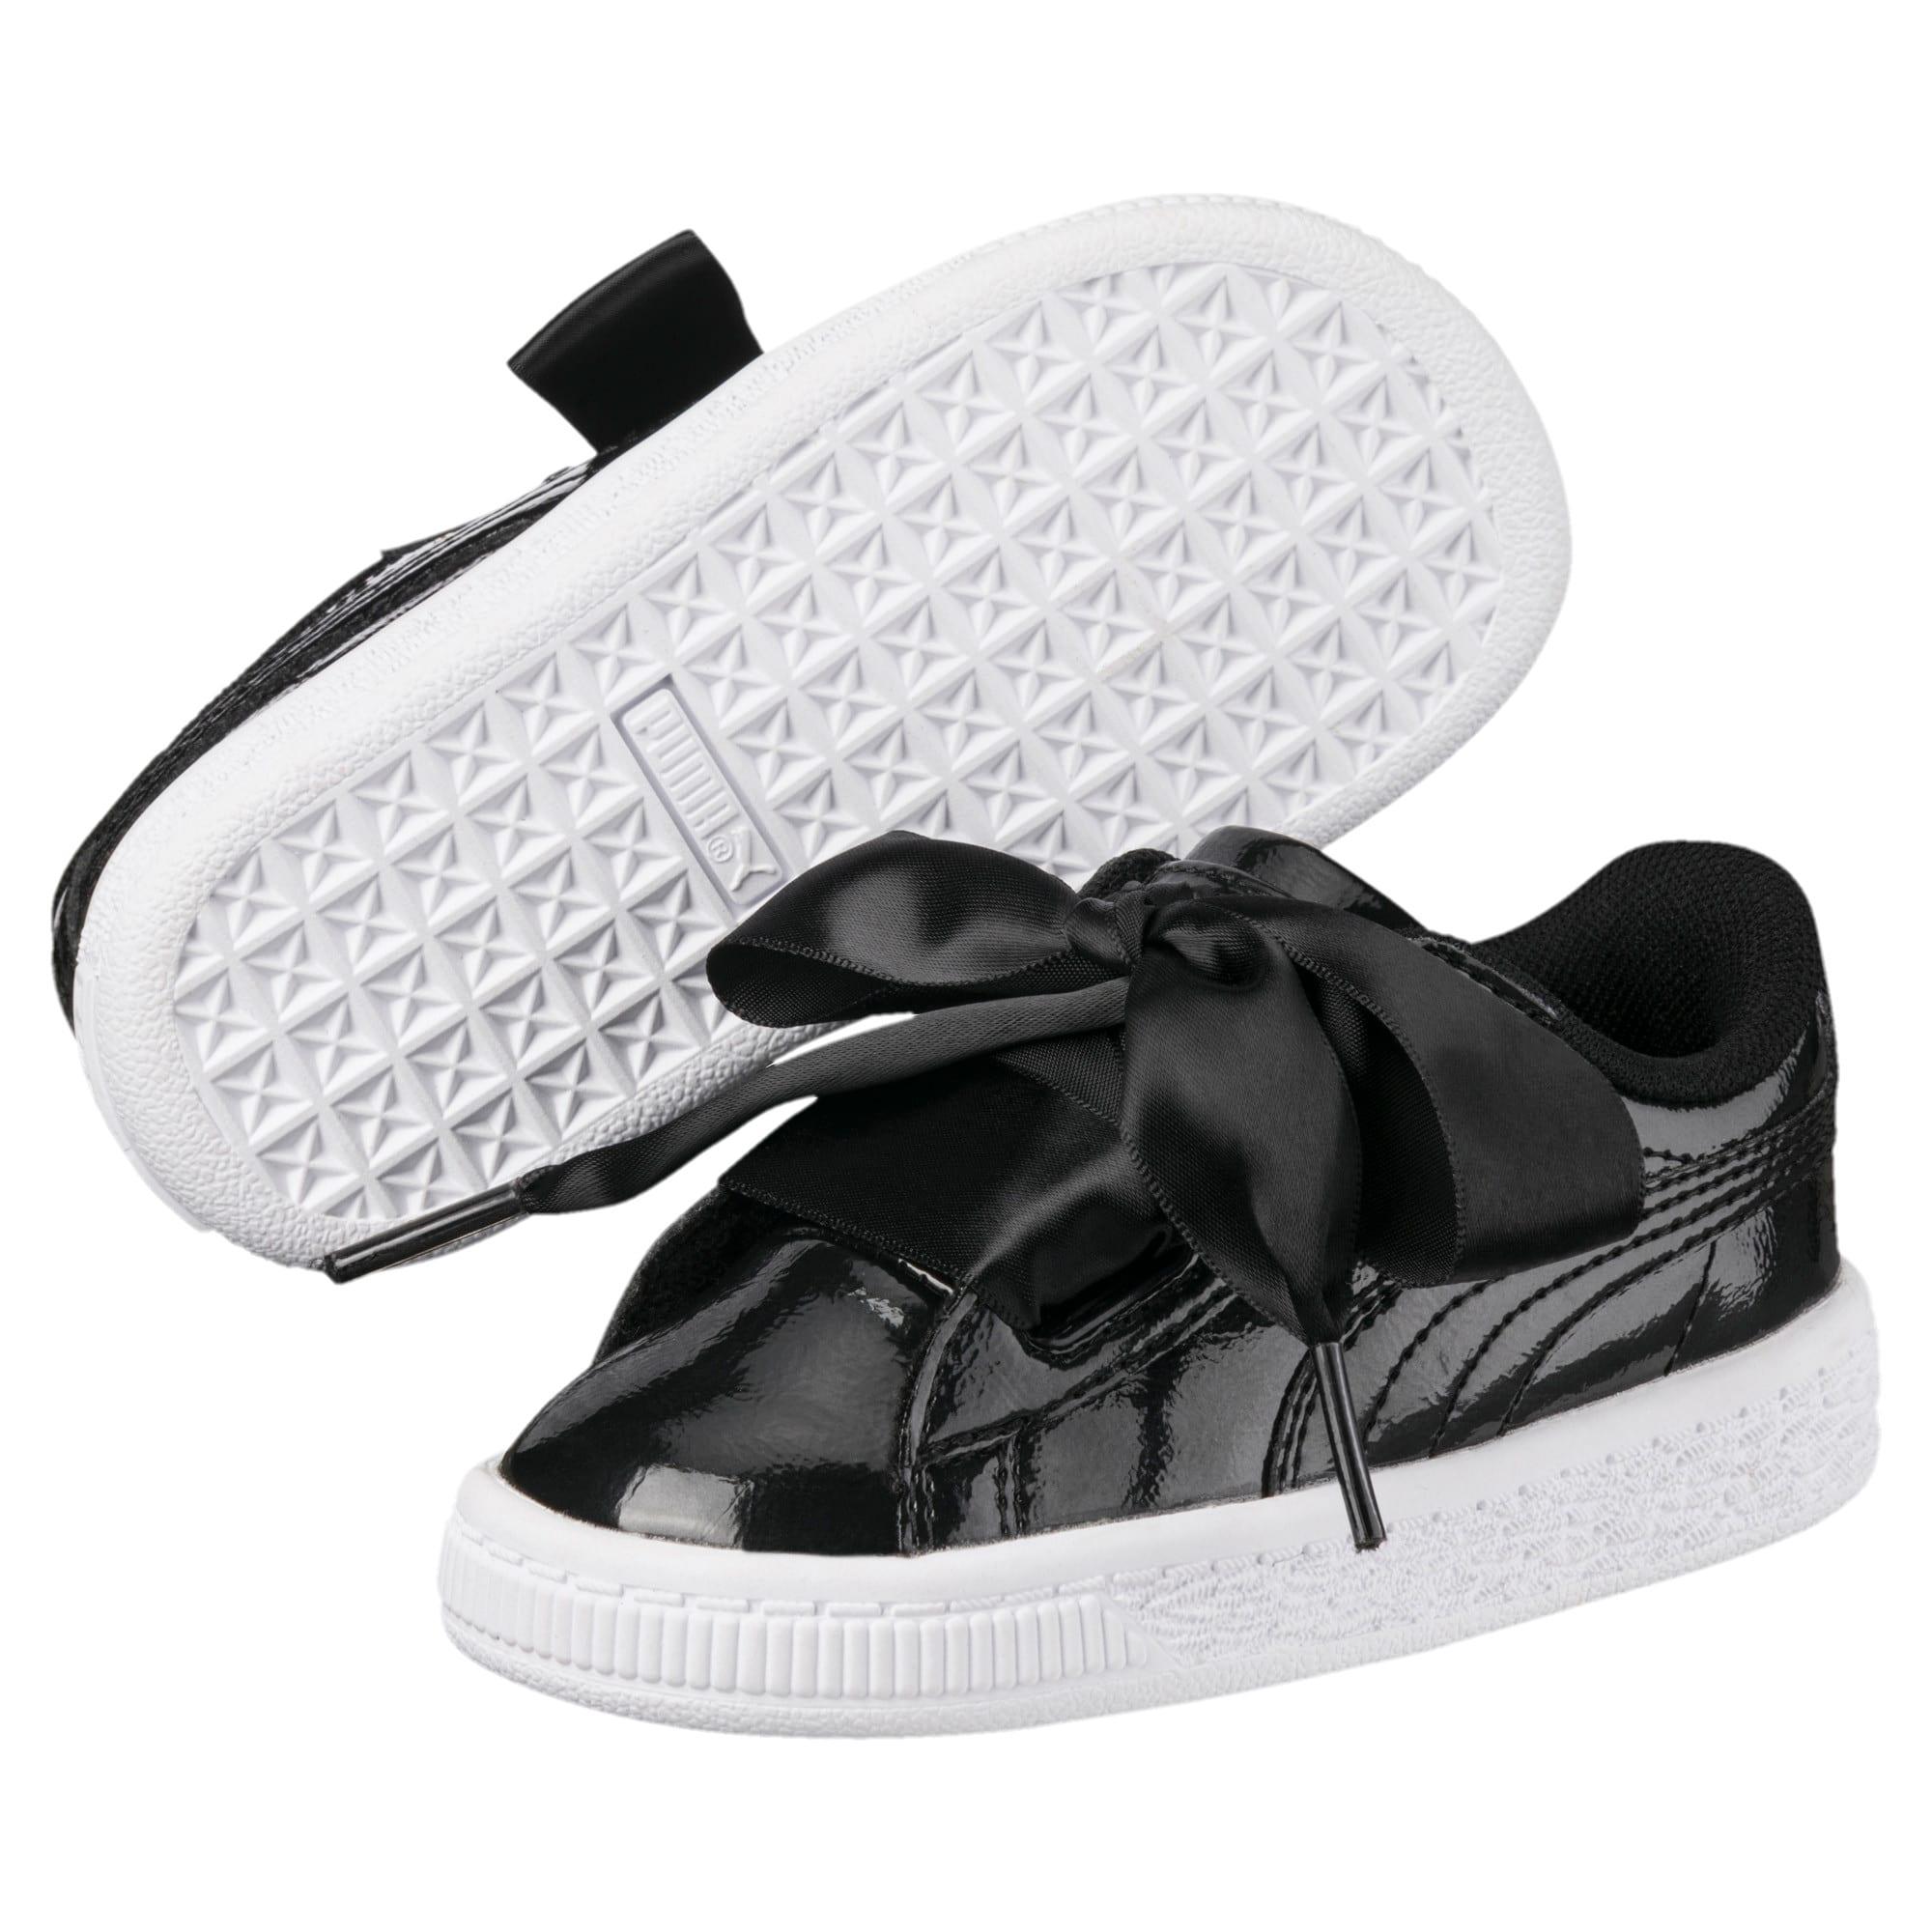 Thumbnail 2 of Basket Heart Glam Girls' Shoes, Puma Black-Puma Black, medium